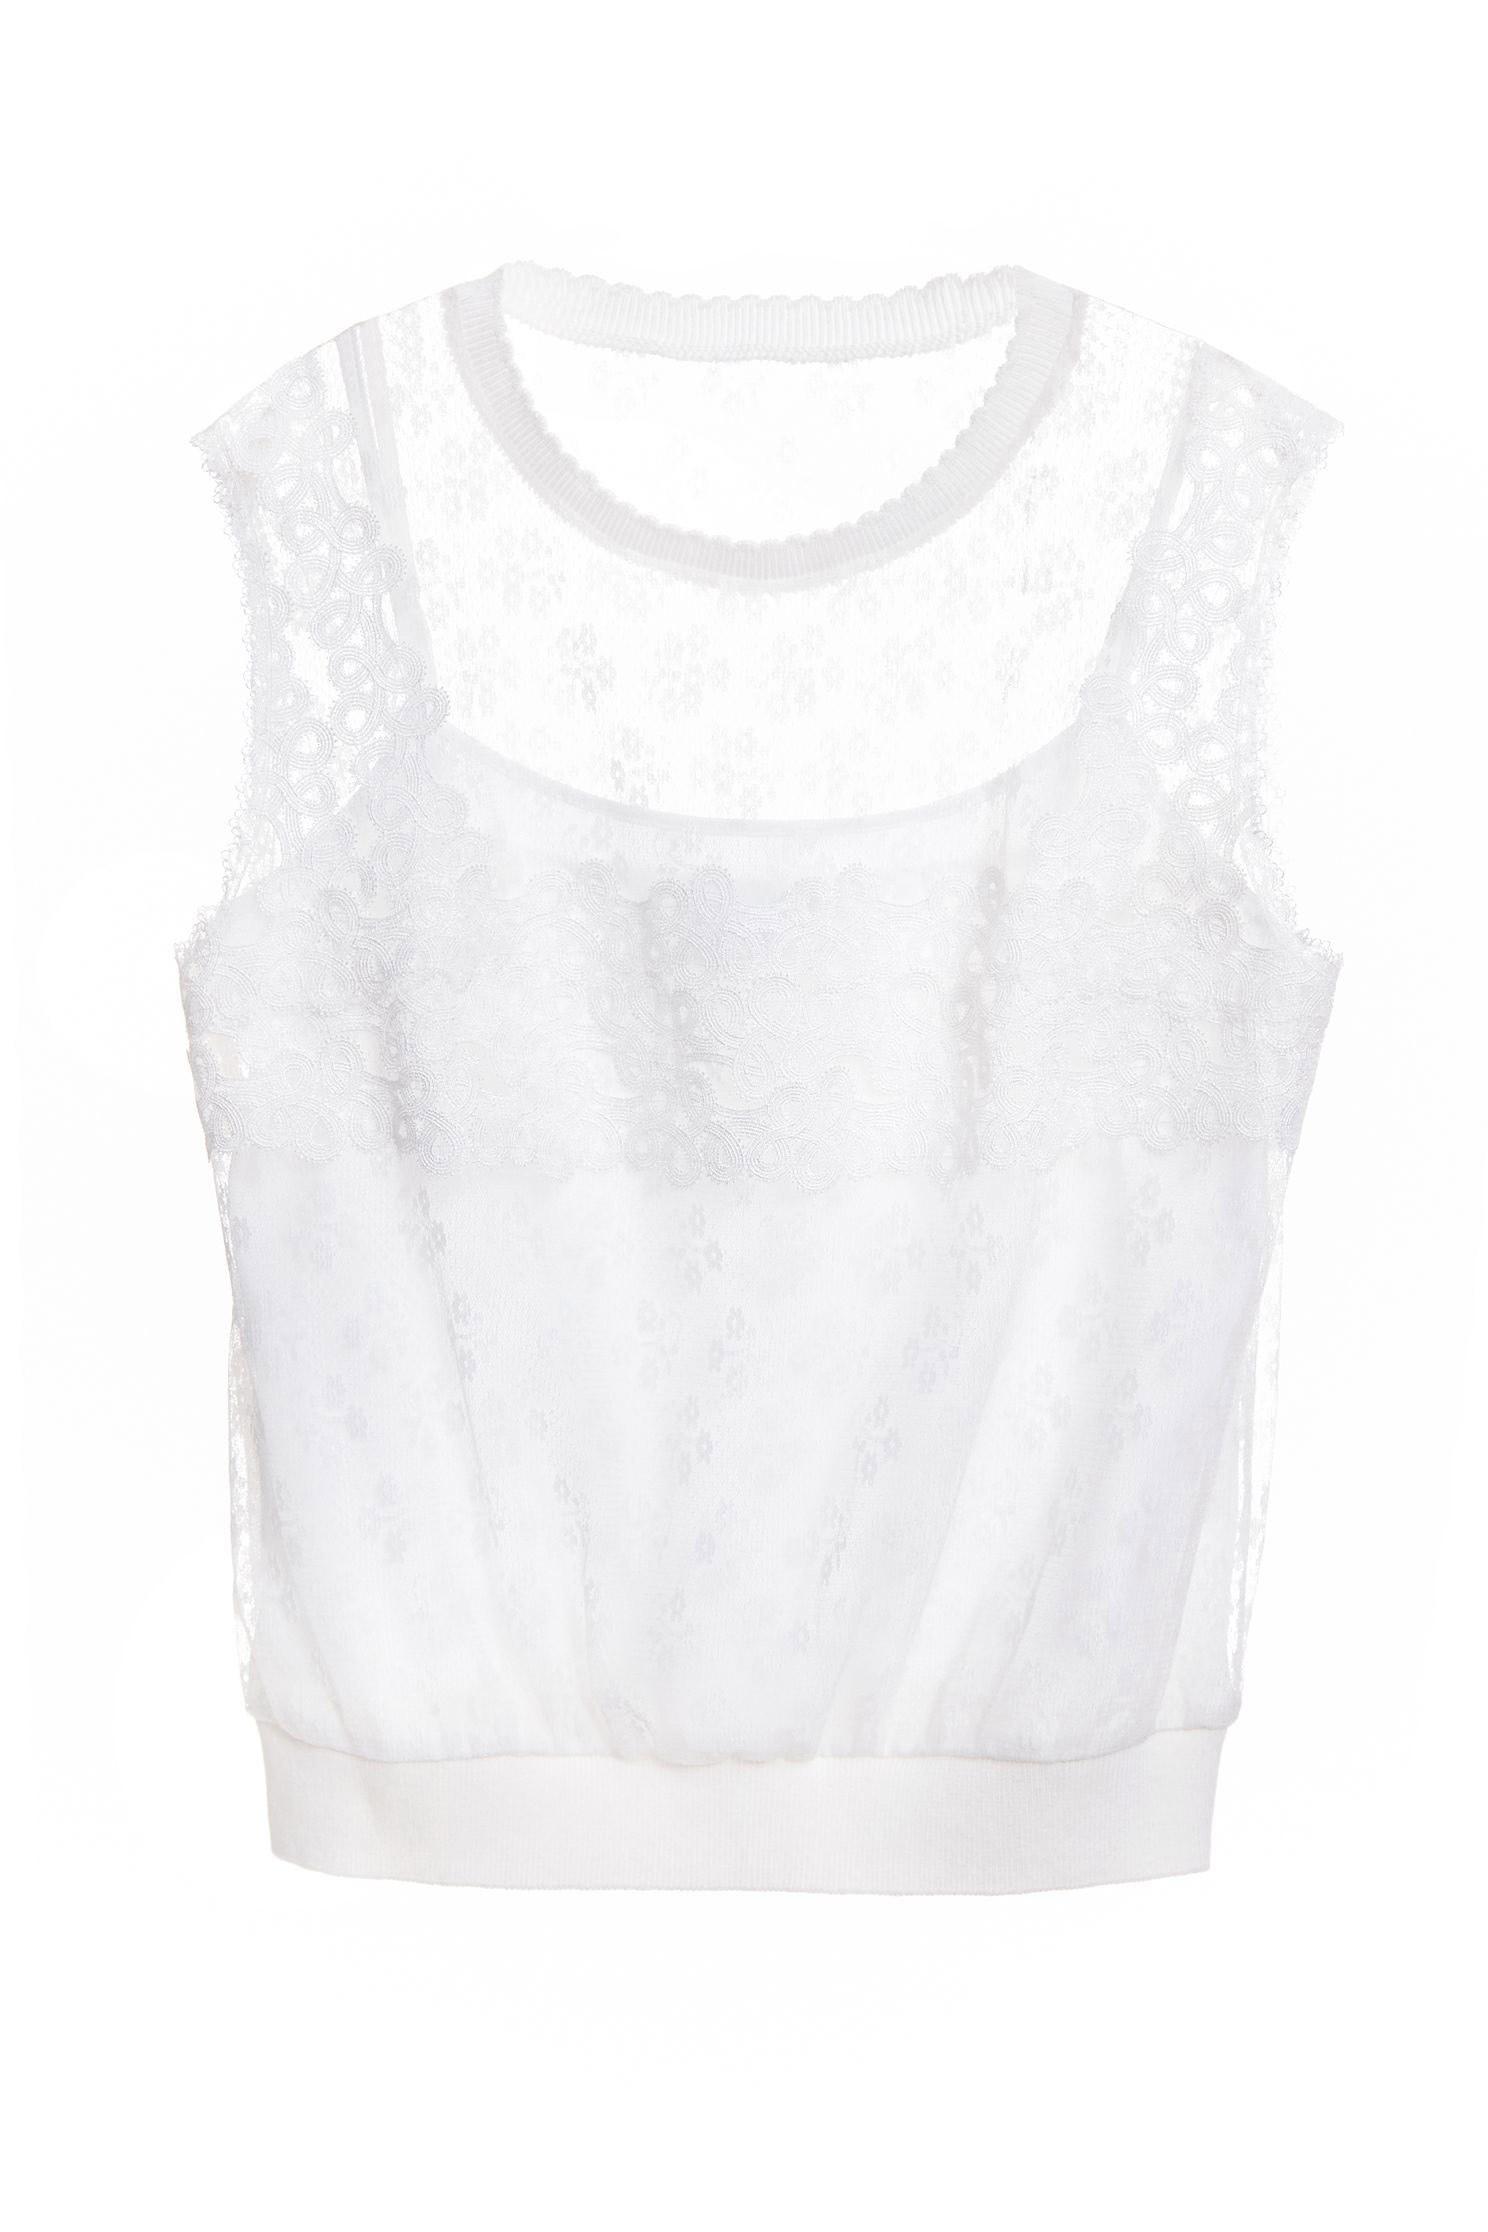 Thin lace round collar vest